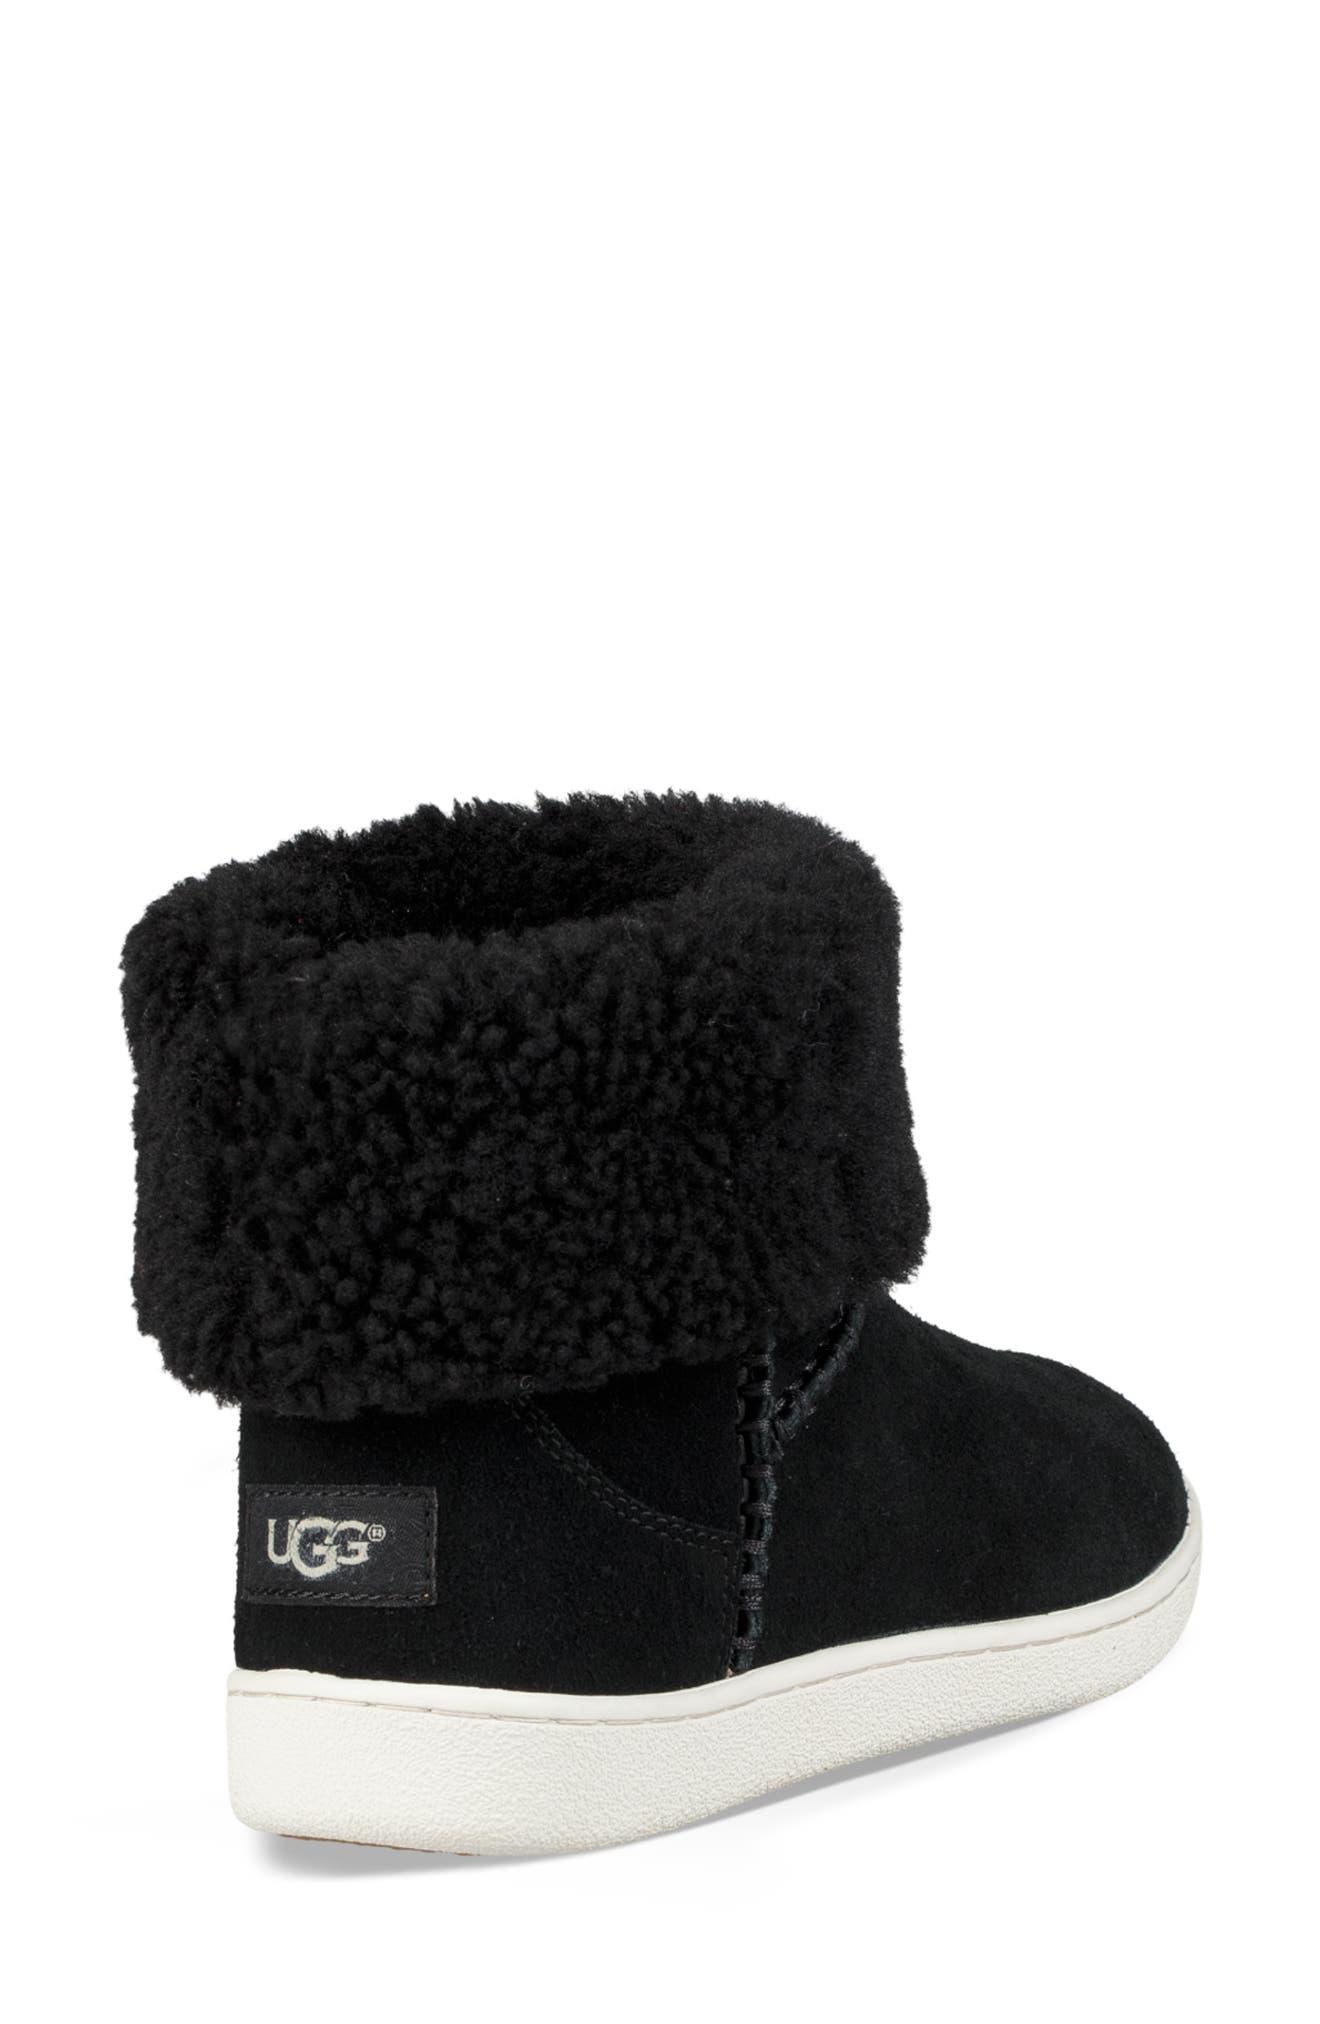 Mika Classic Genuine Shearling Sneaker,                             Alternate thumbnail 3, color,                             BLACK